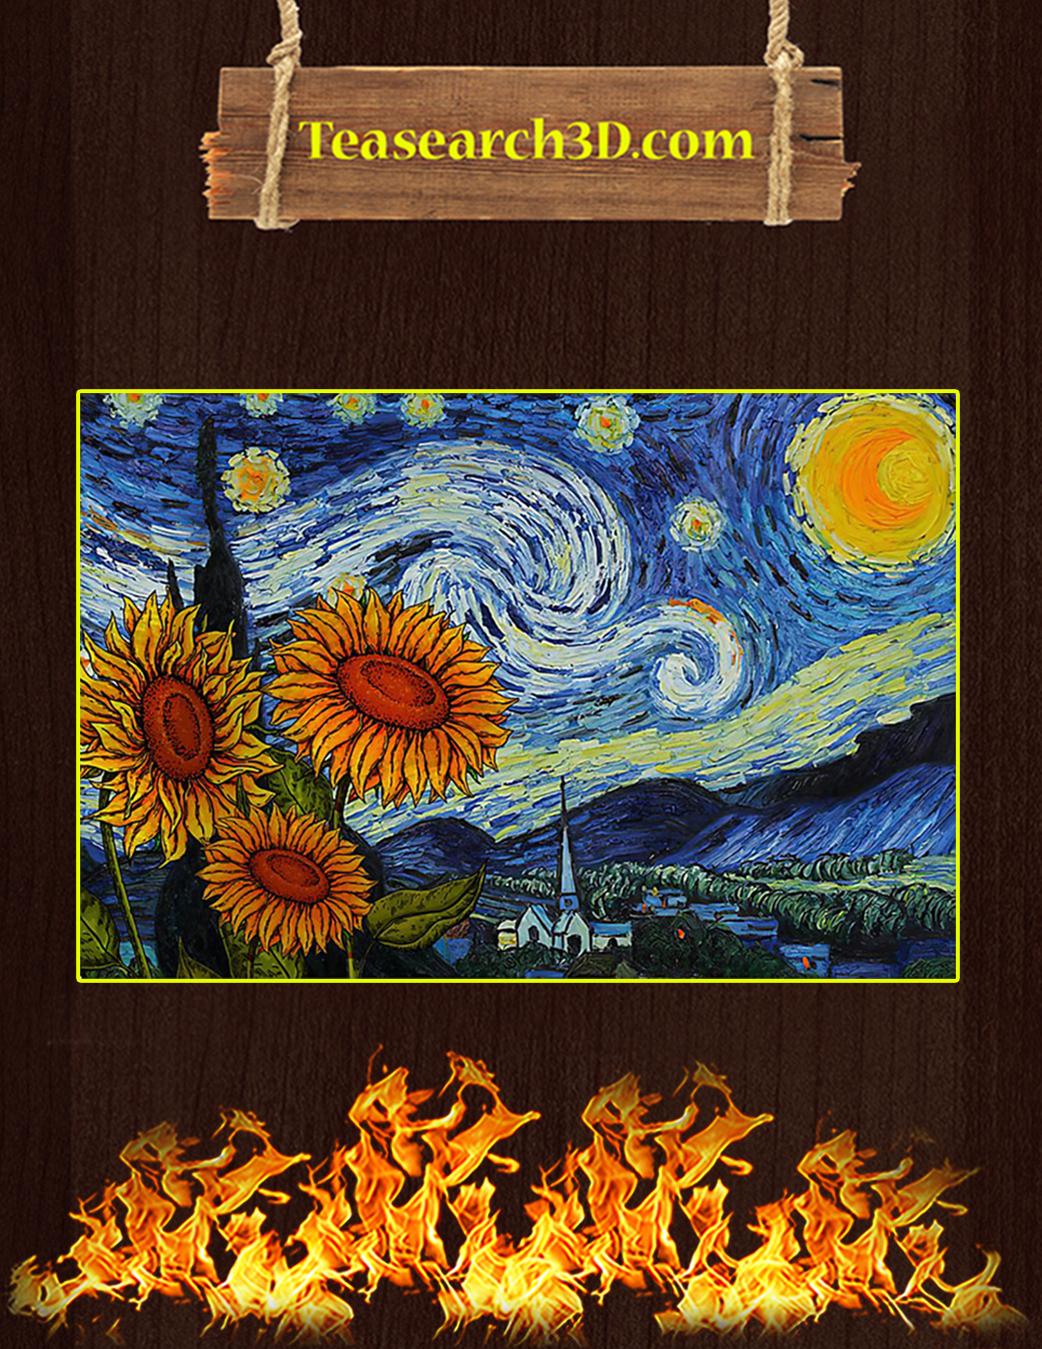 Sunflowers starry night van gogh canvas prints small